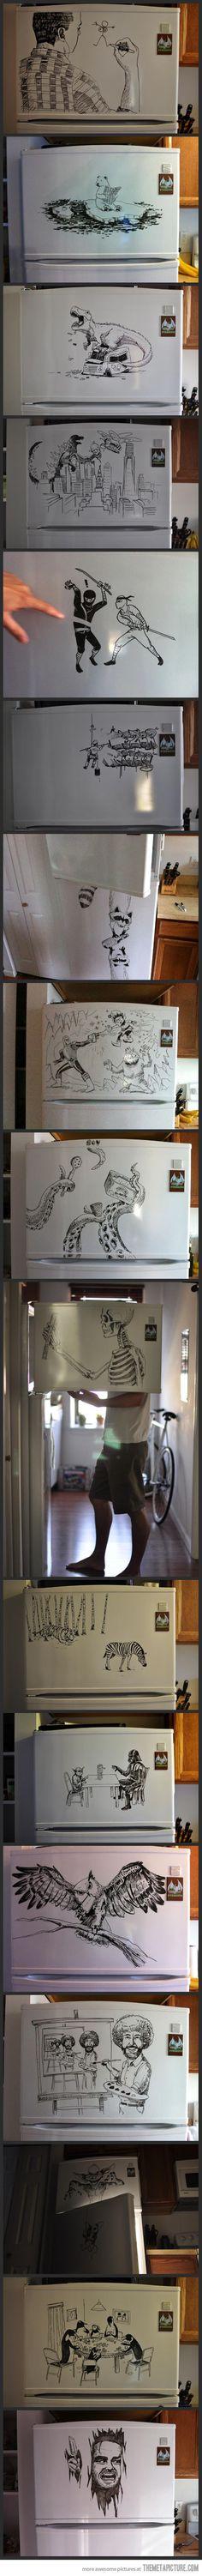 Freezer Art…awesome!